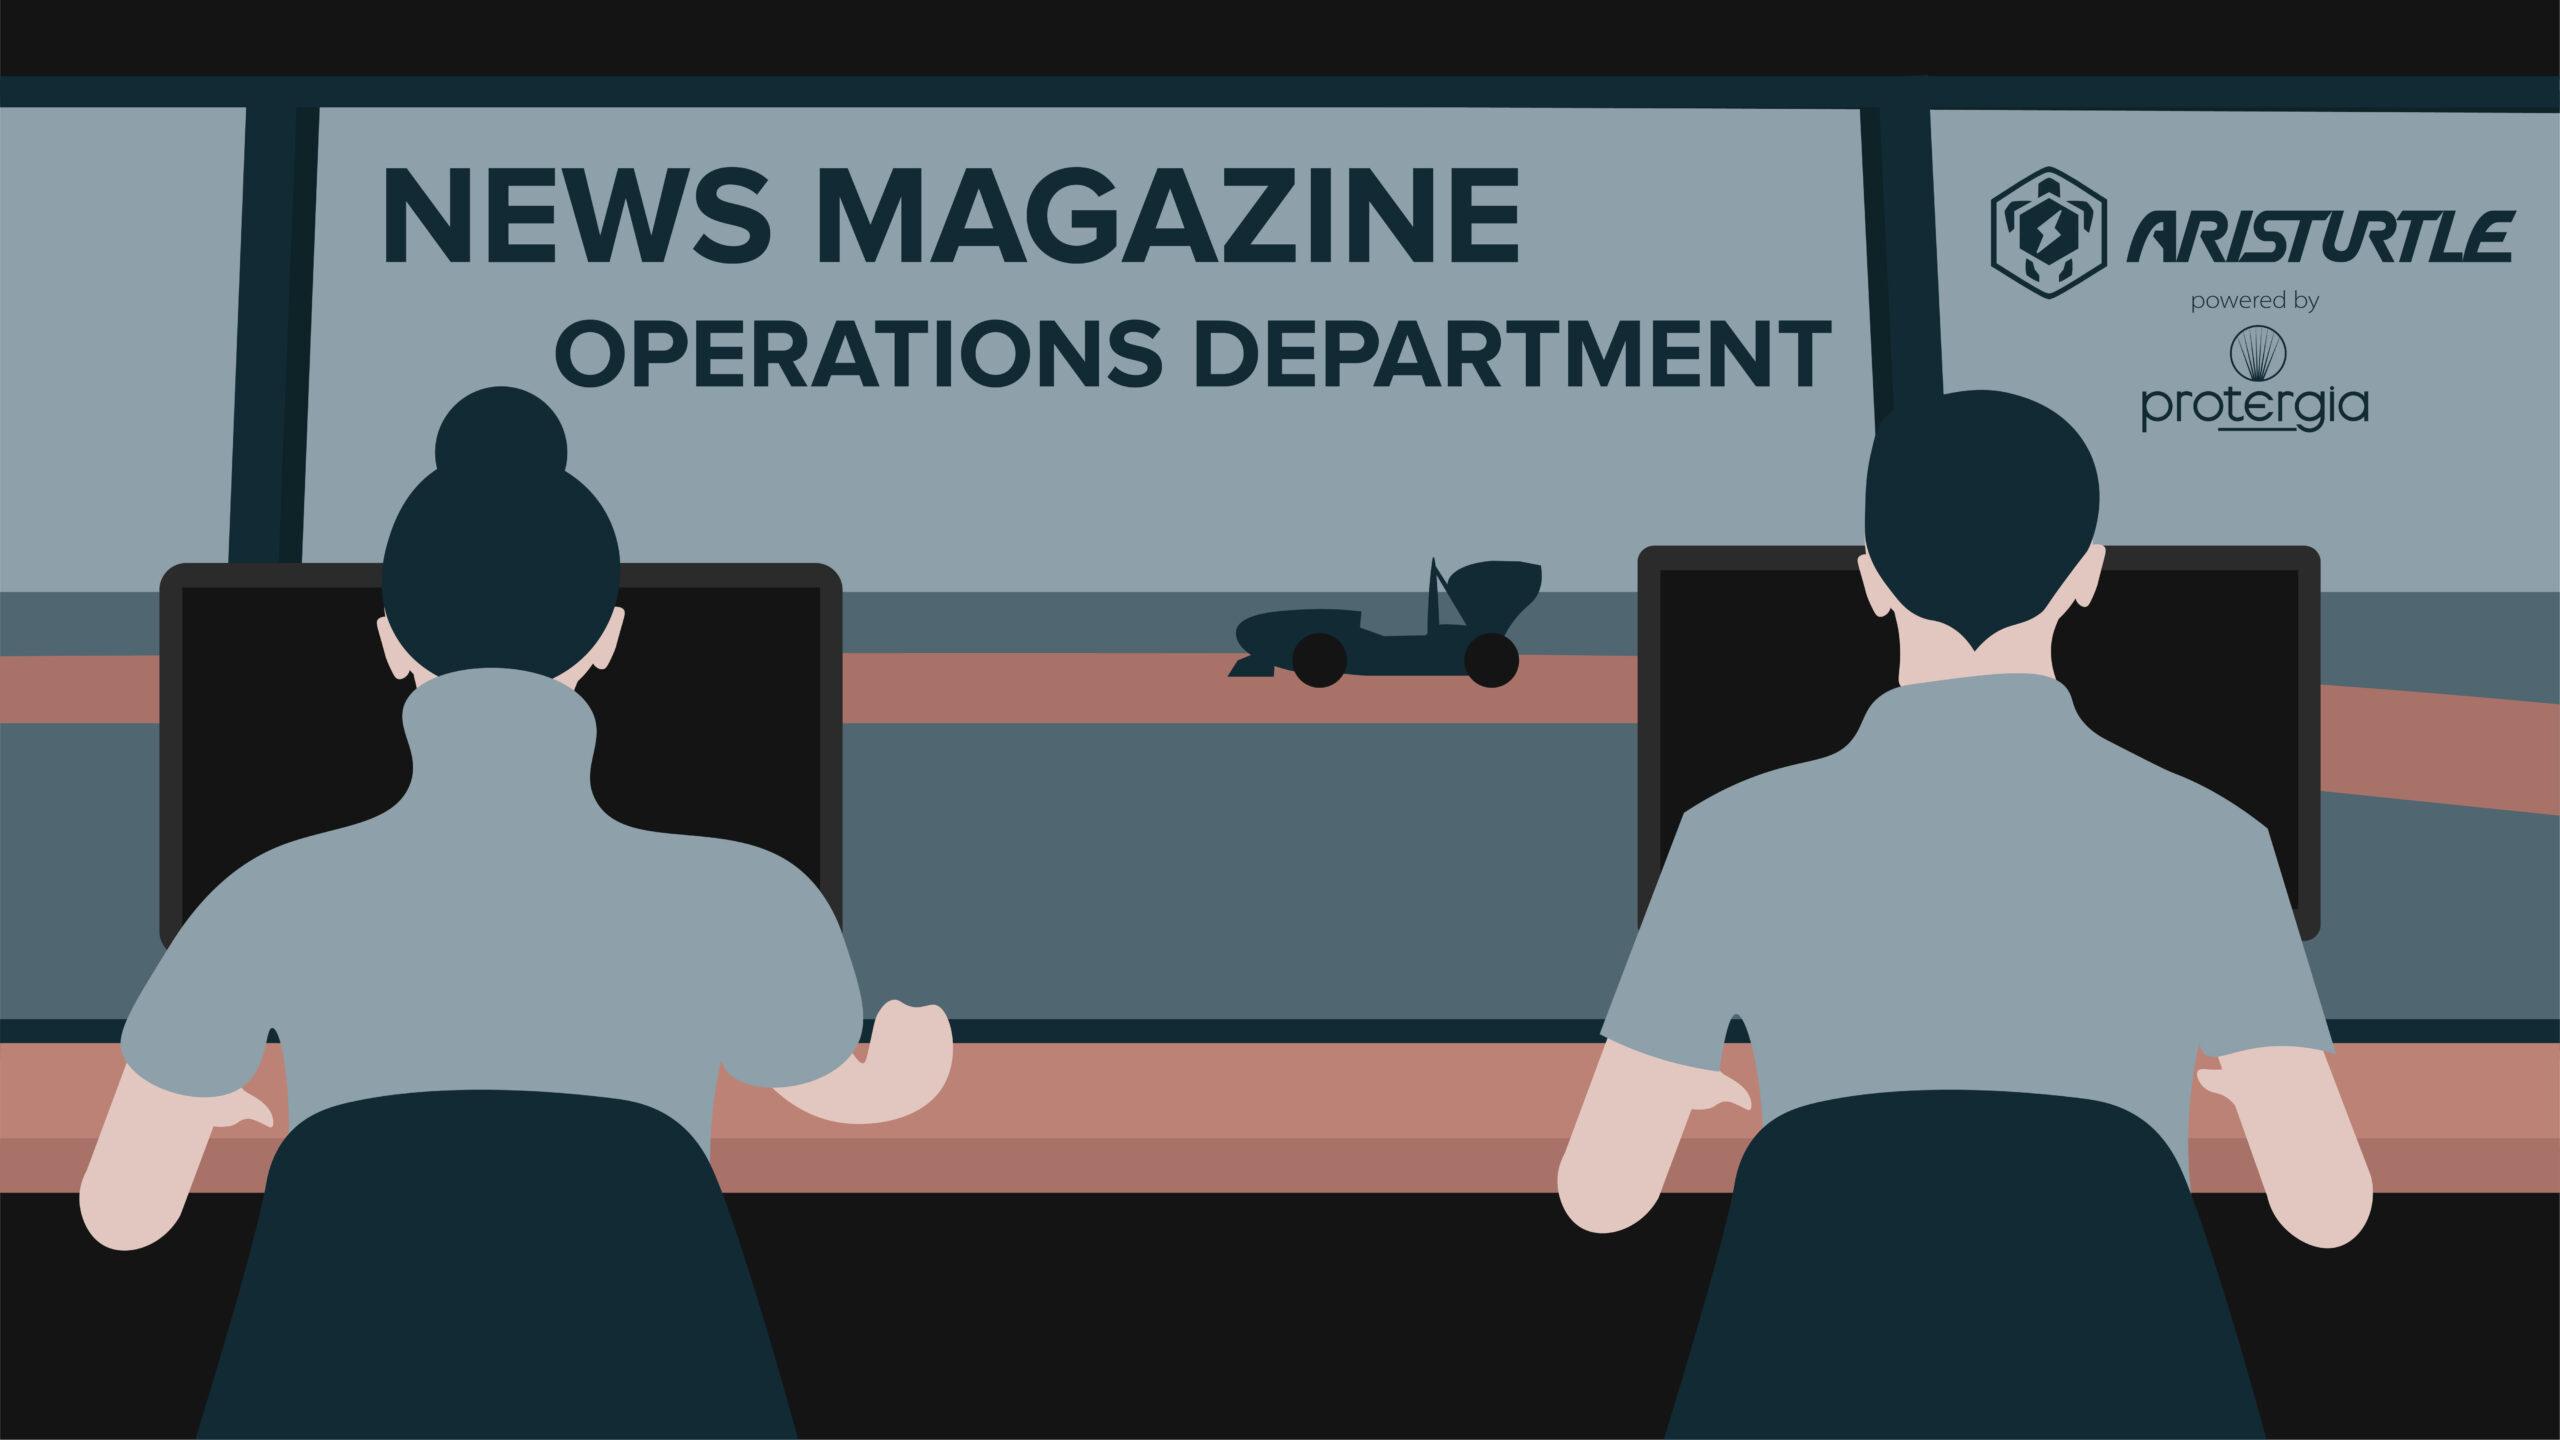 News Magazine – Operations Department